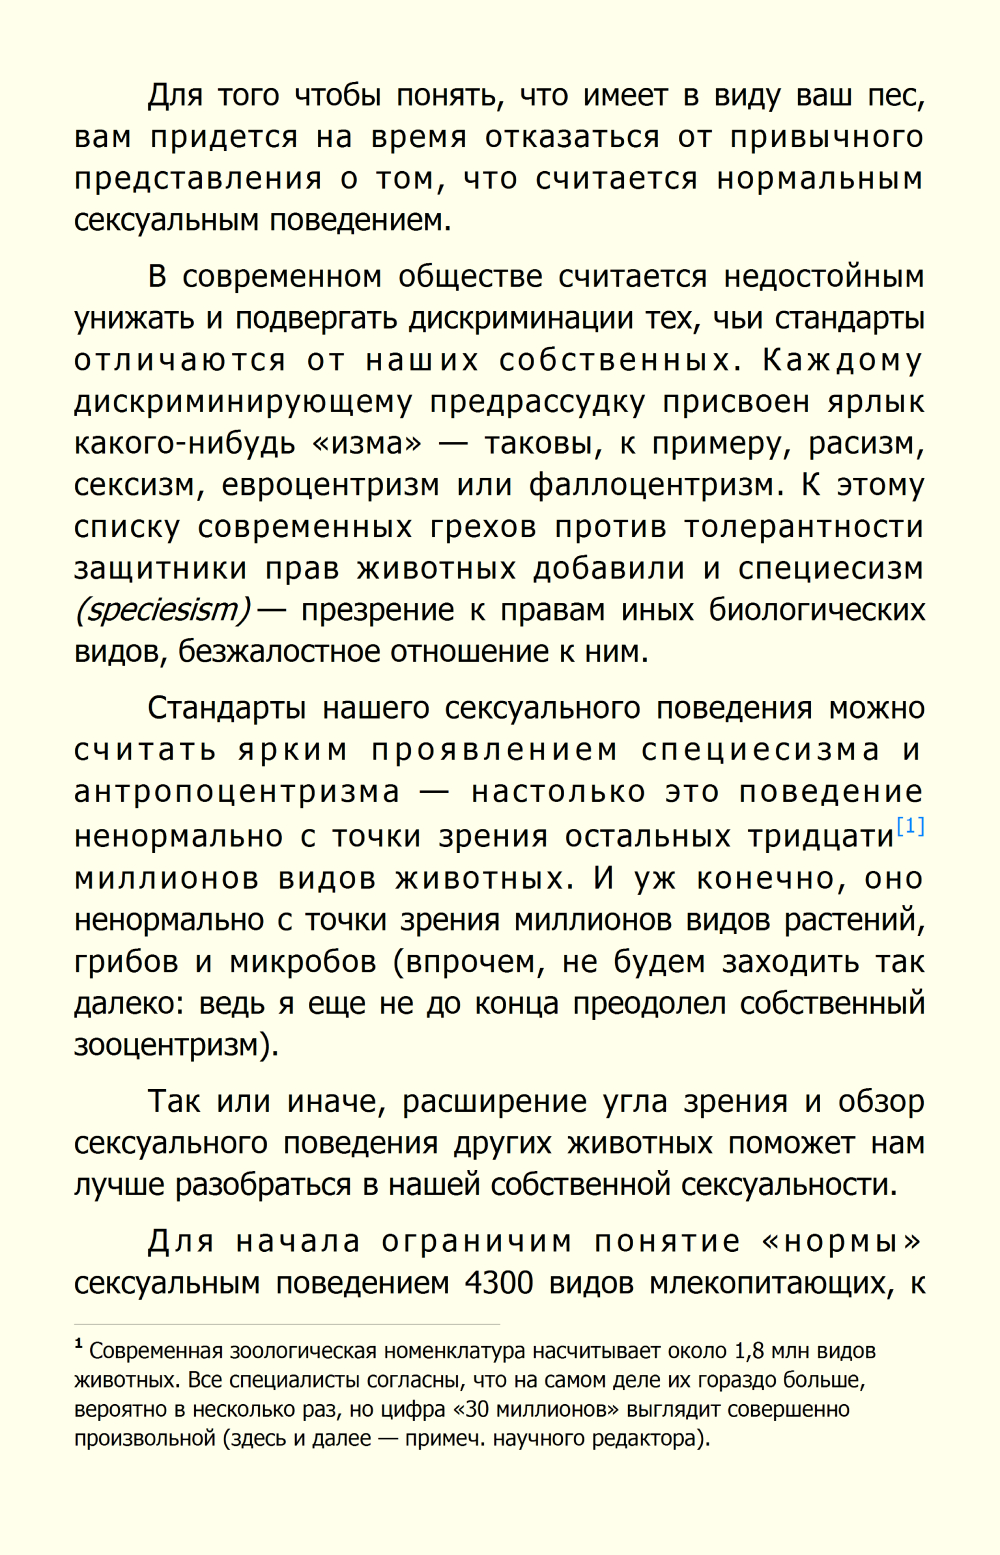 http://i6.imageban.ru/out/2014/01/21/707a12c78f5680751e8e5692c70cab93.jpg